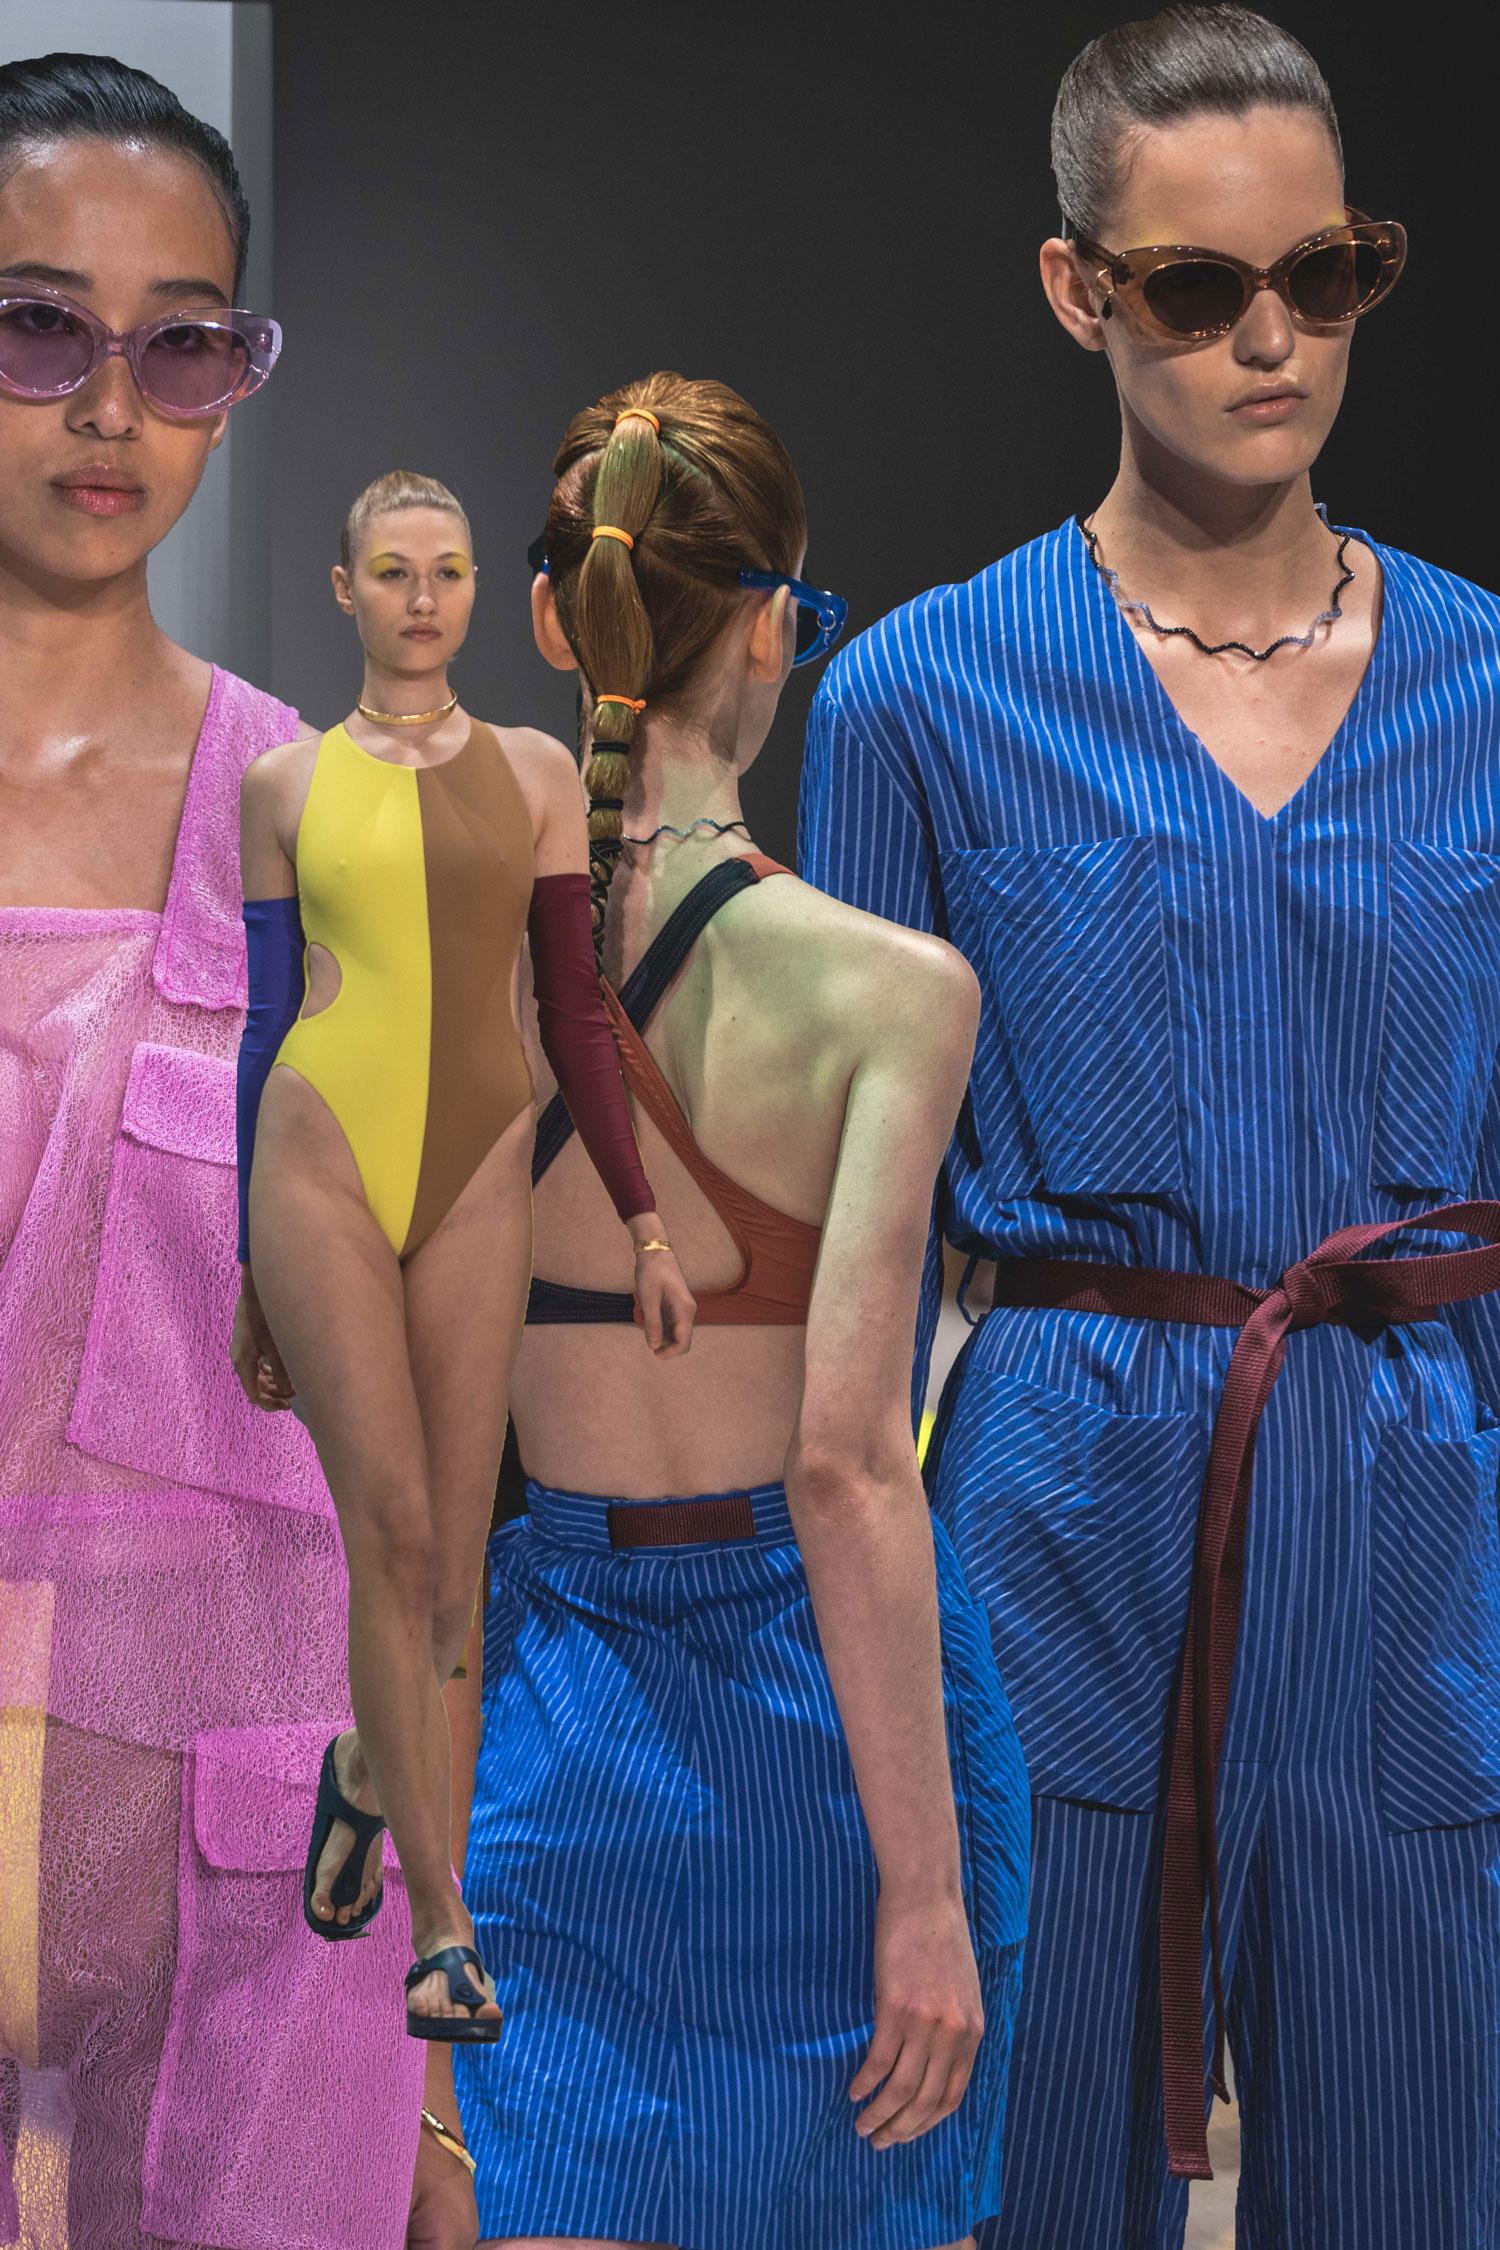 the-fashion-heist-pageant-azar-image-mbfwa-2017-7424-edit